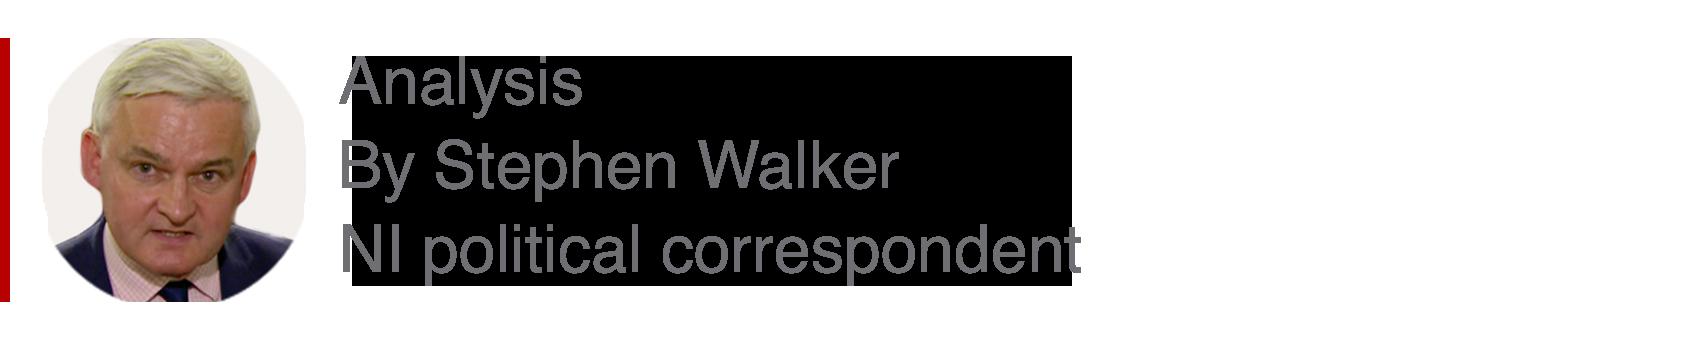 Analysis box by Stephen Walker, NI political correspondent